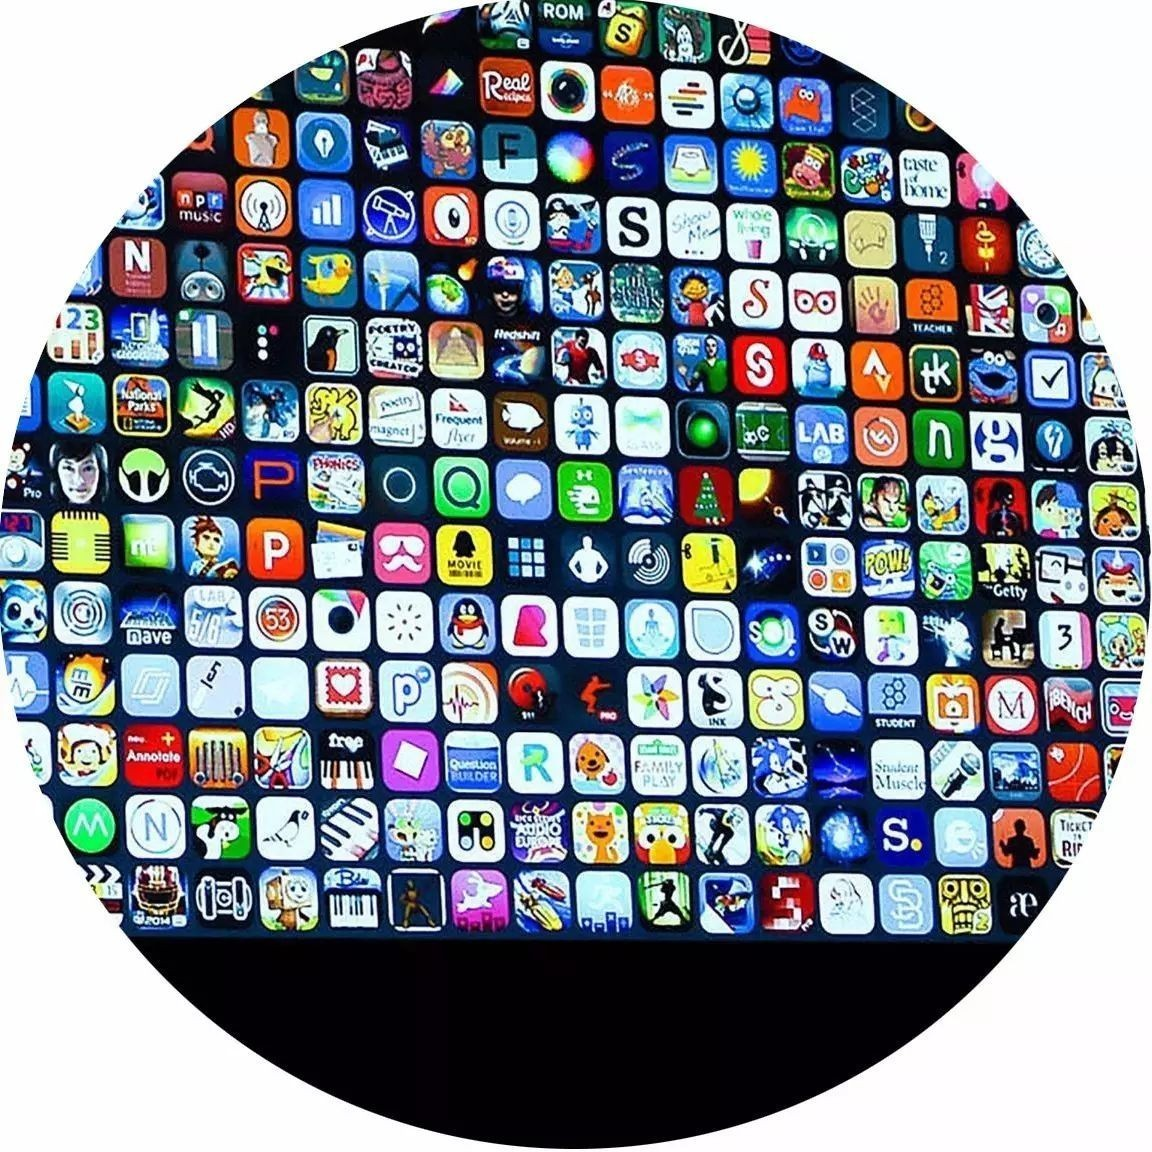 苹果应用商店_appstore